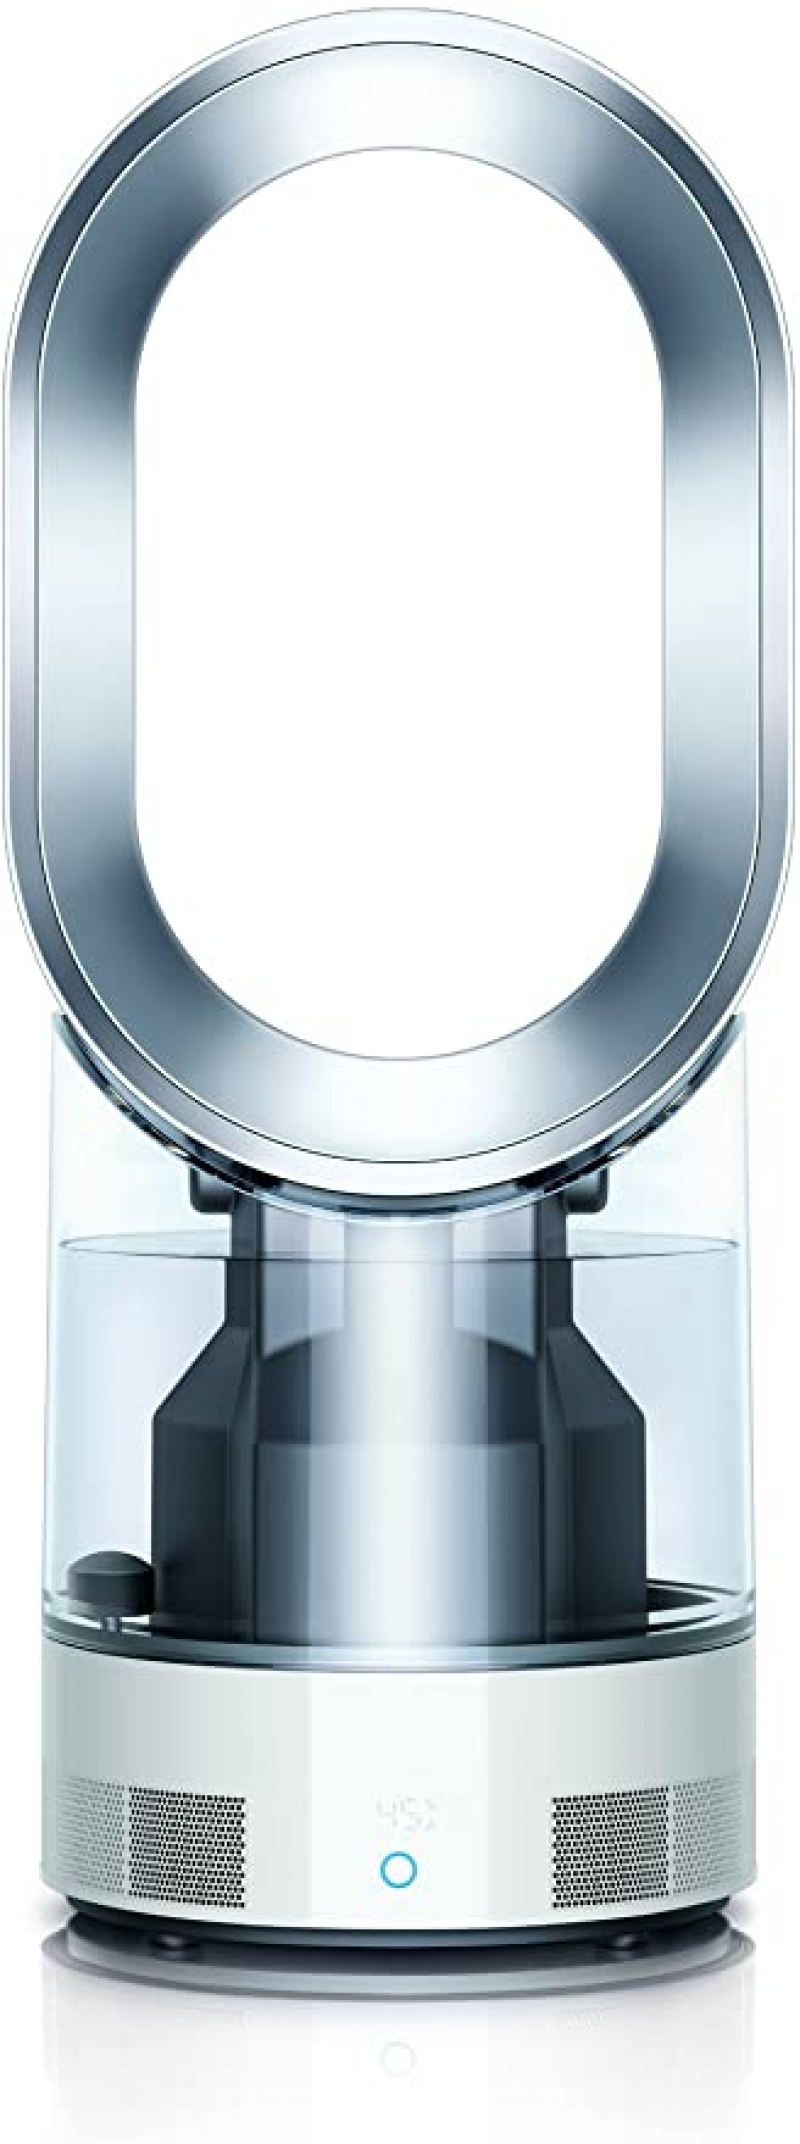 ihocon: Dyson AM10 Humidifier 室內加濕風扇